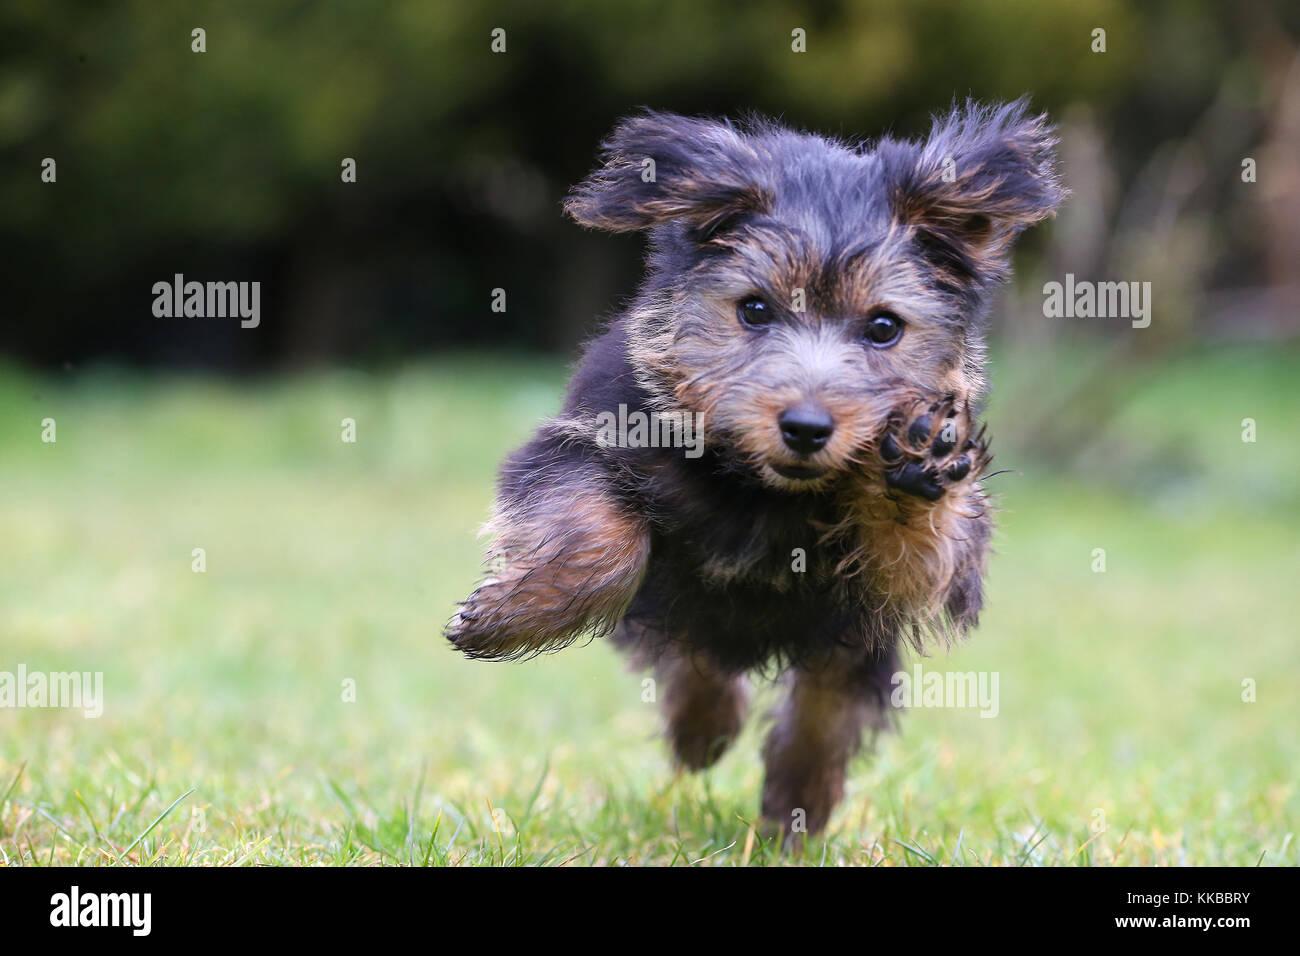 Terrier - Norfolk Norfolk Terrier Puppy - Stock Image